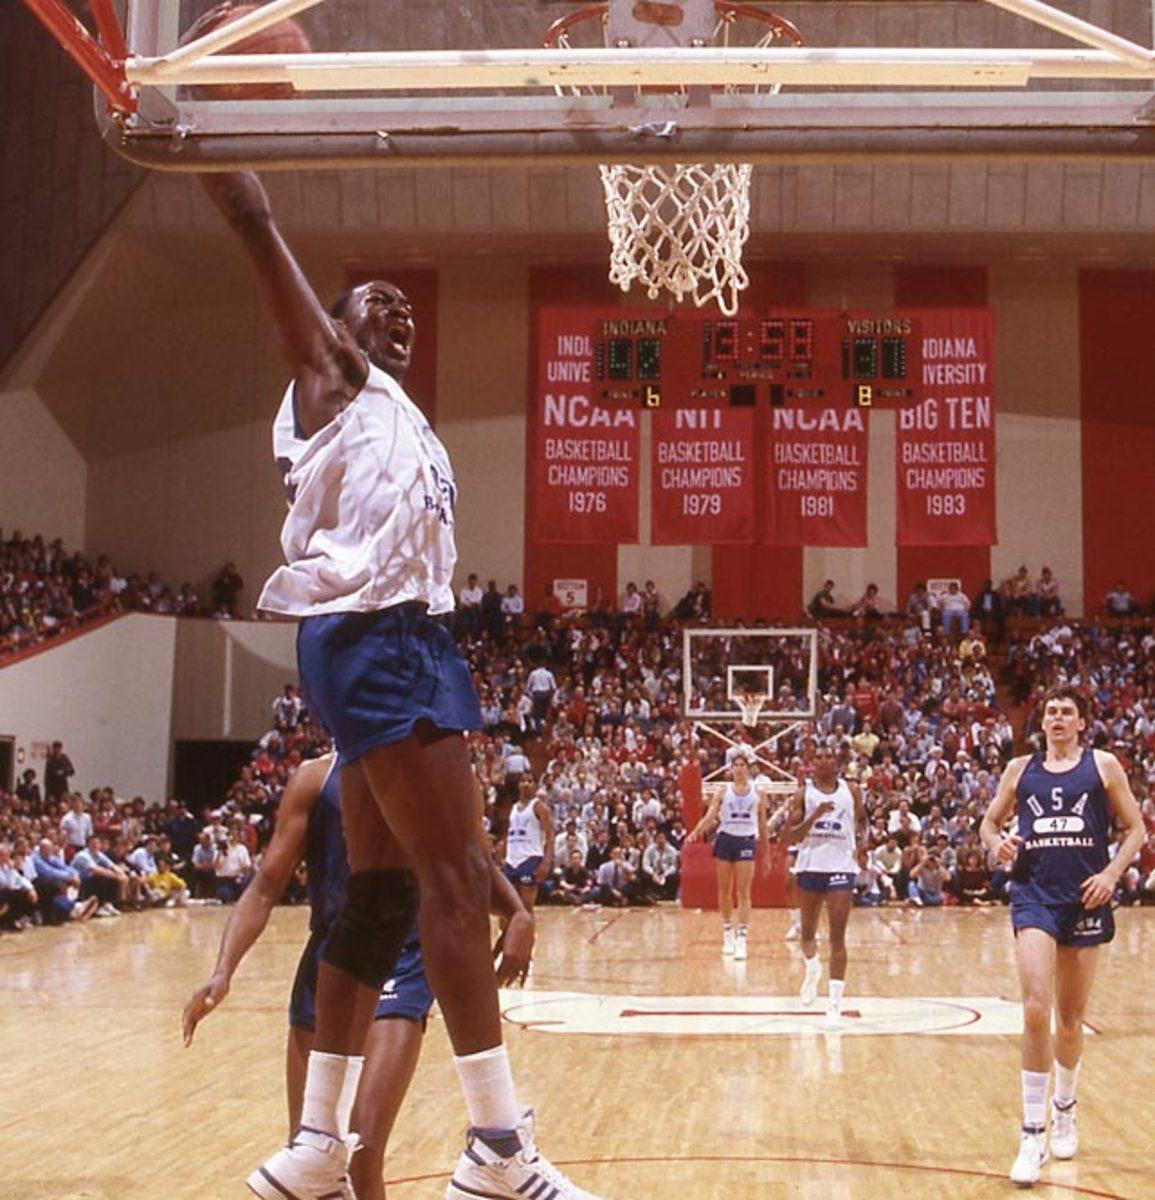 140430121344-1984-olympic-basketball-dotcom128-single-image-cut.jpg